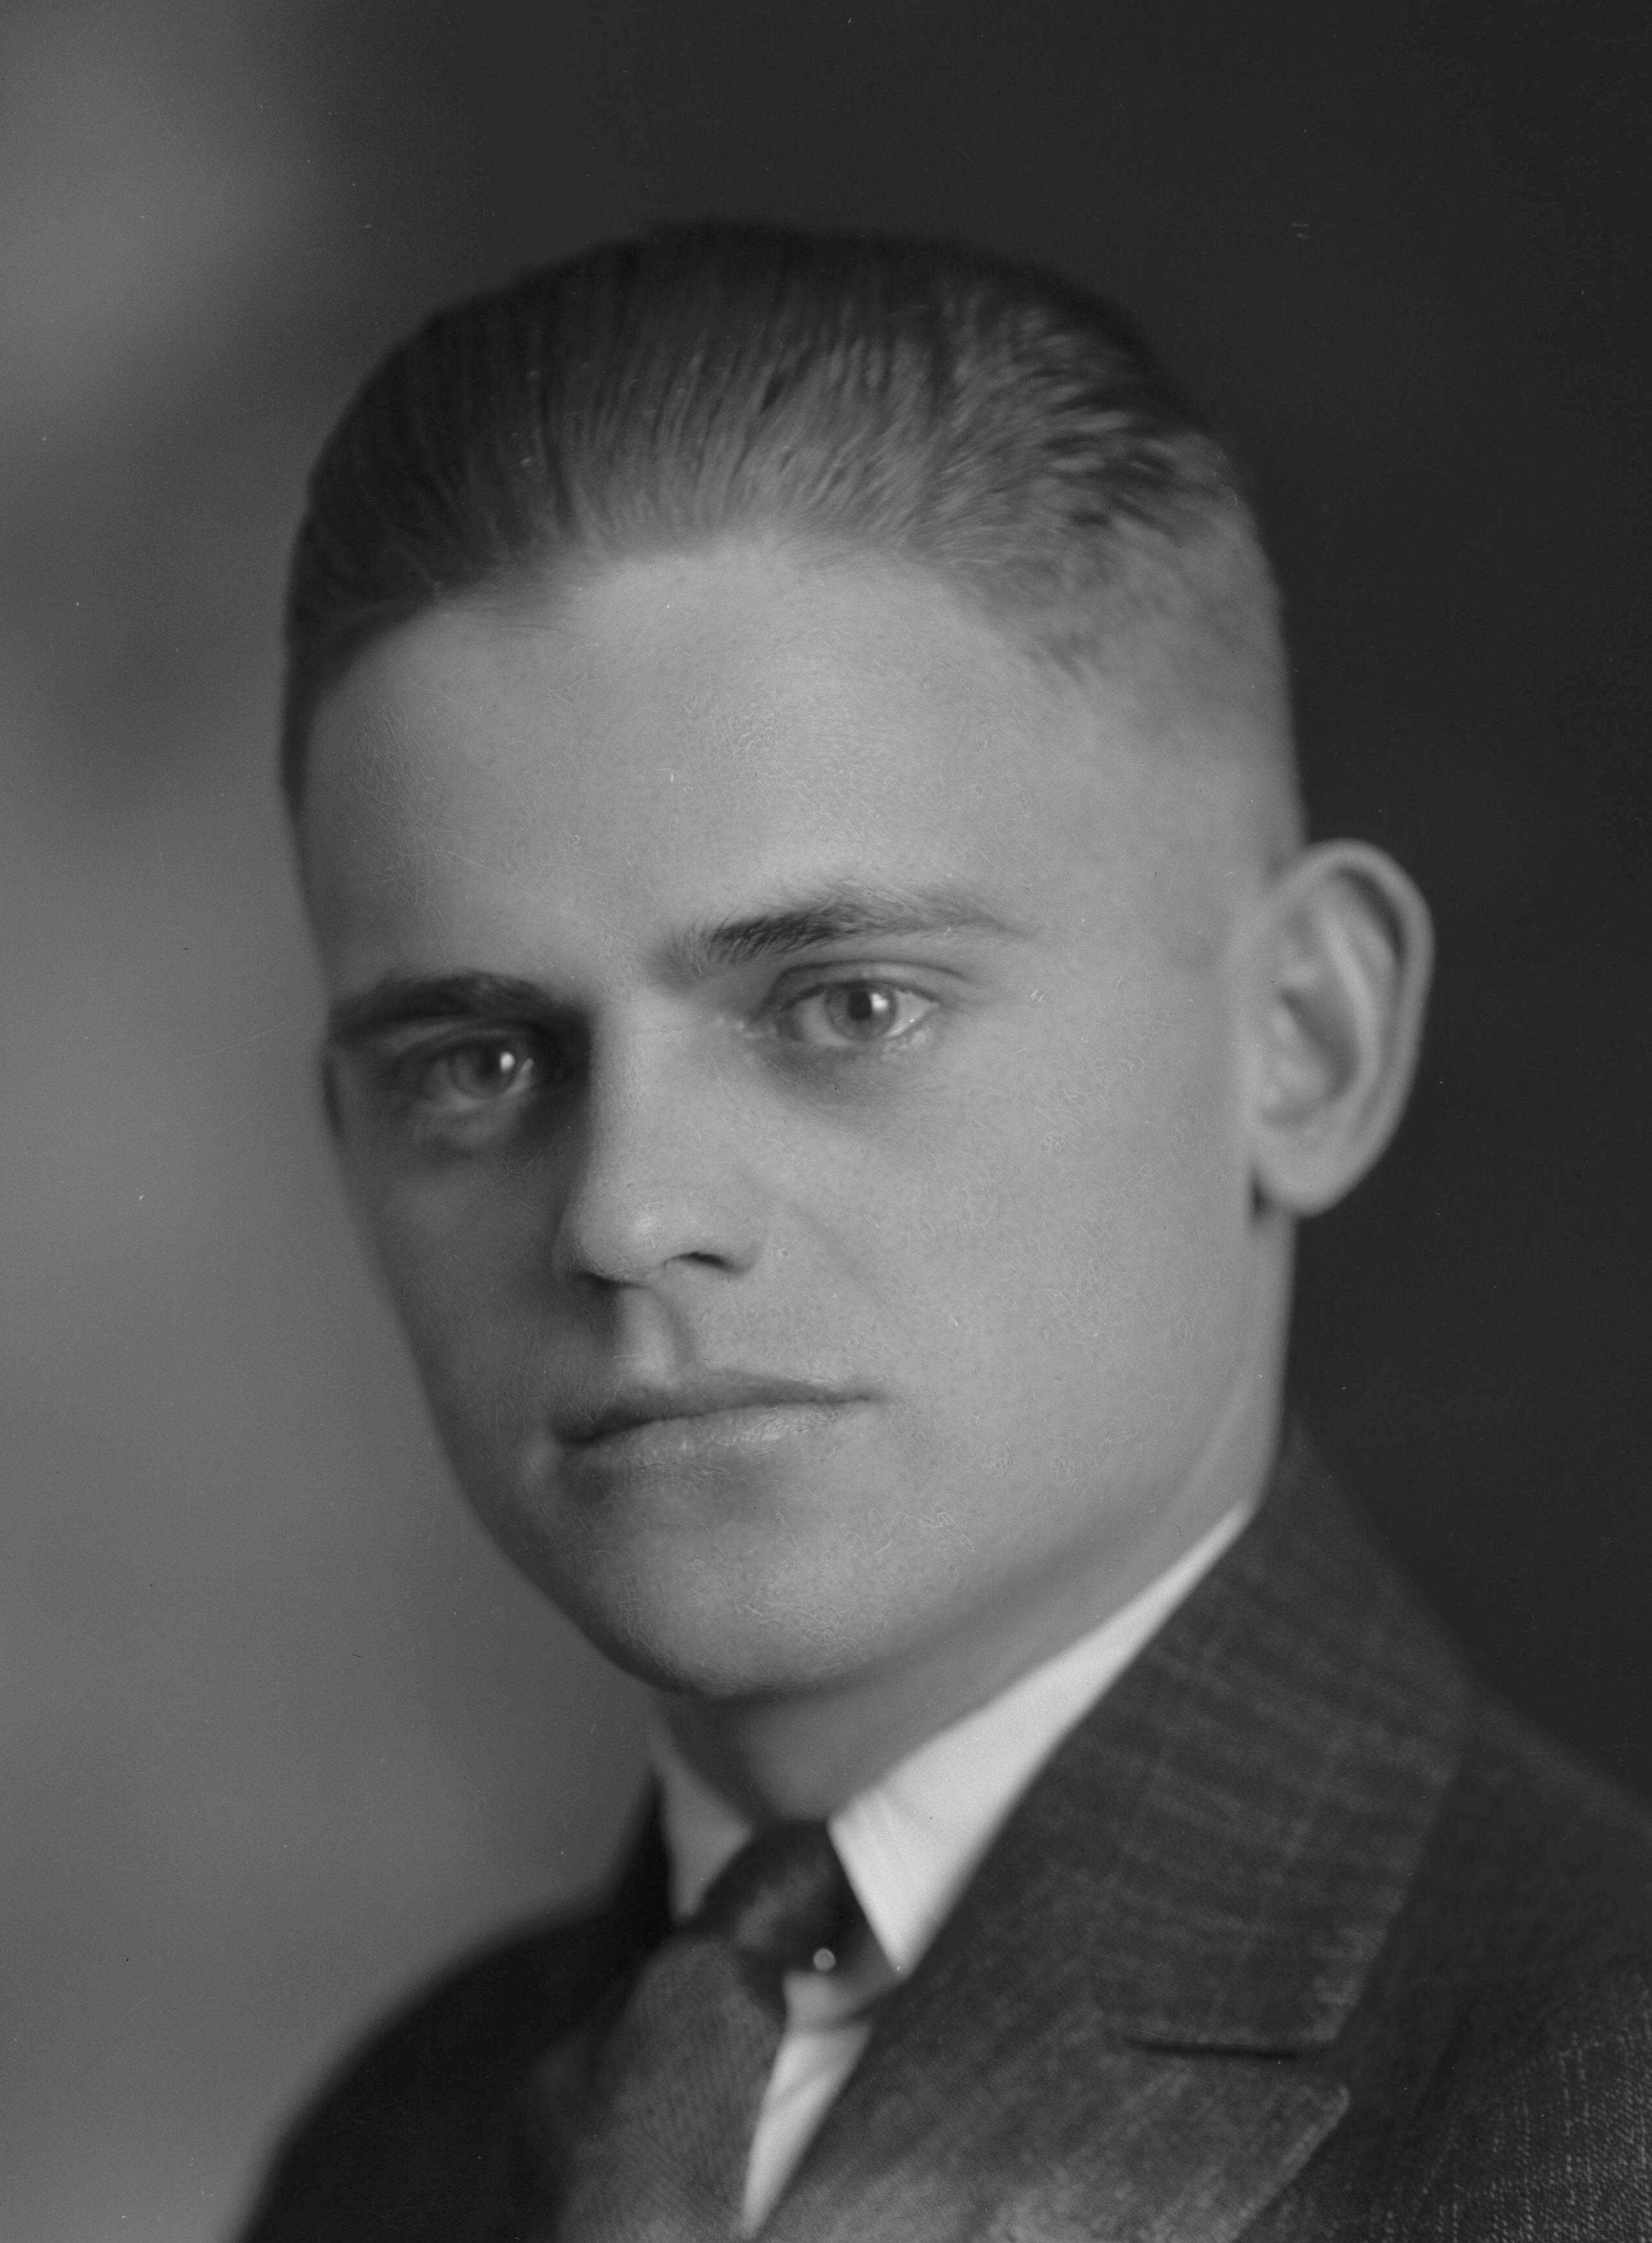 Soderberg, Adolph